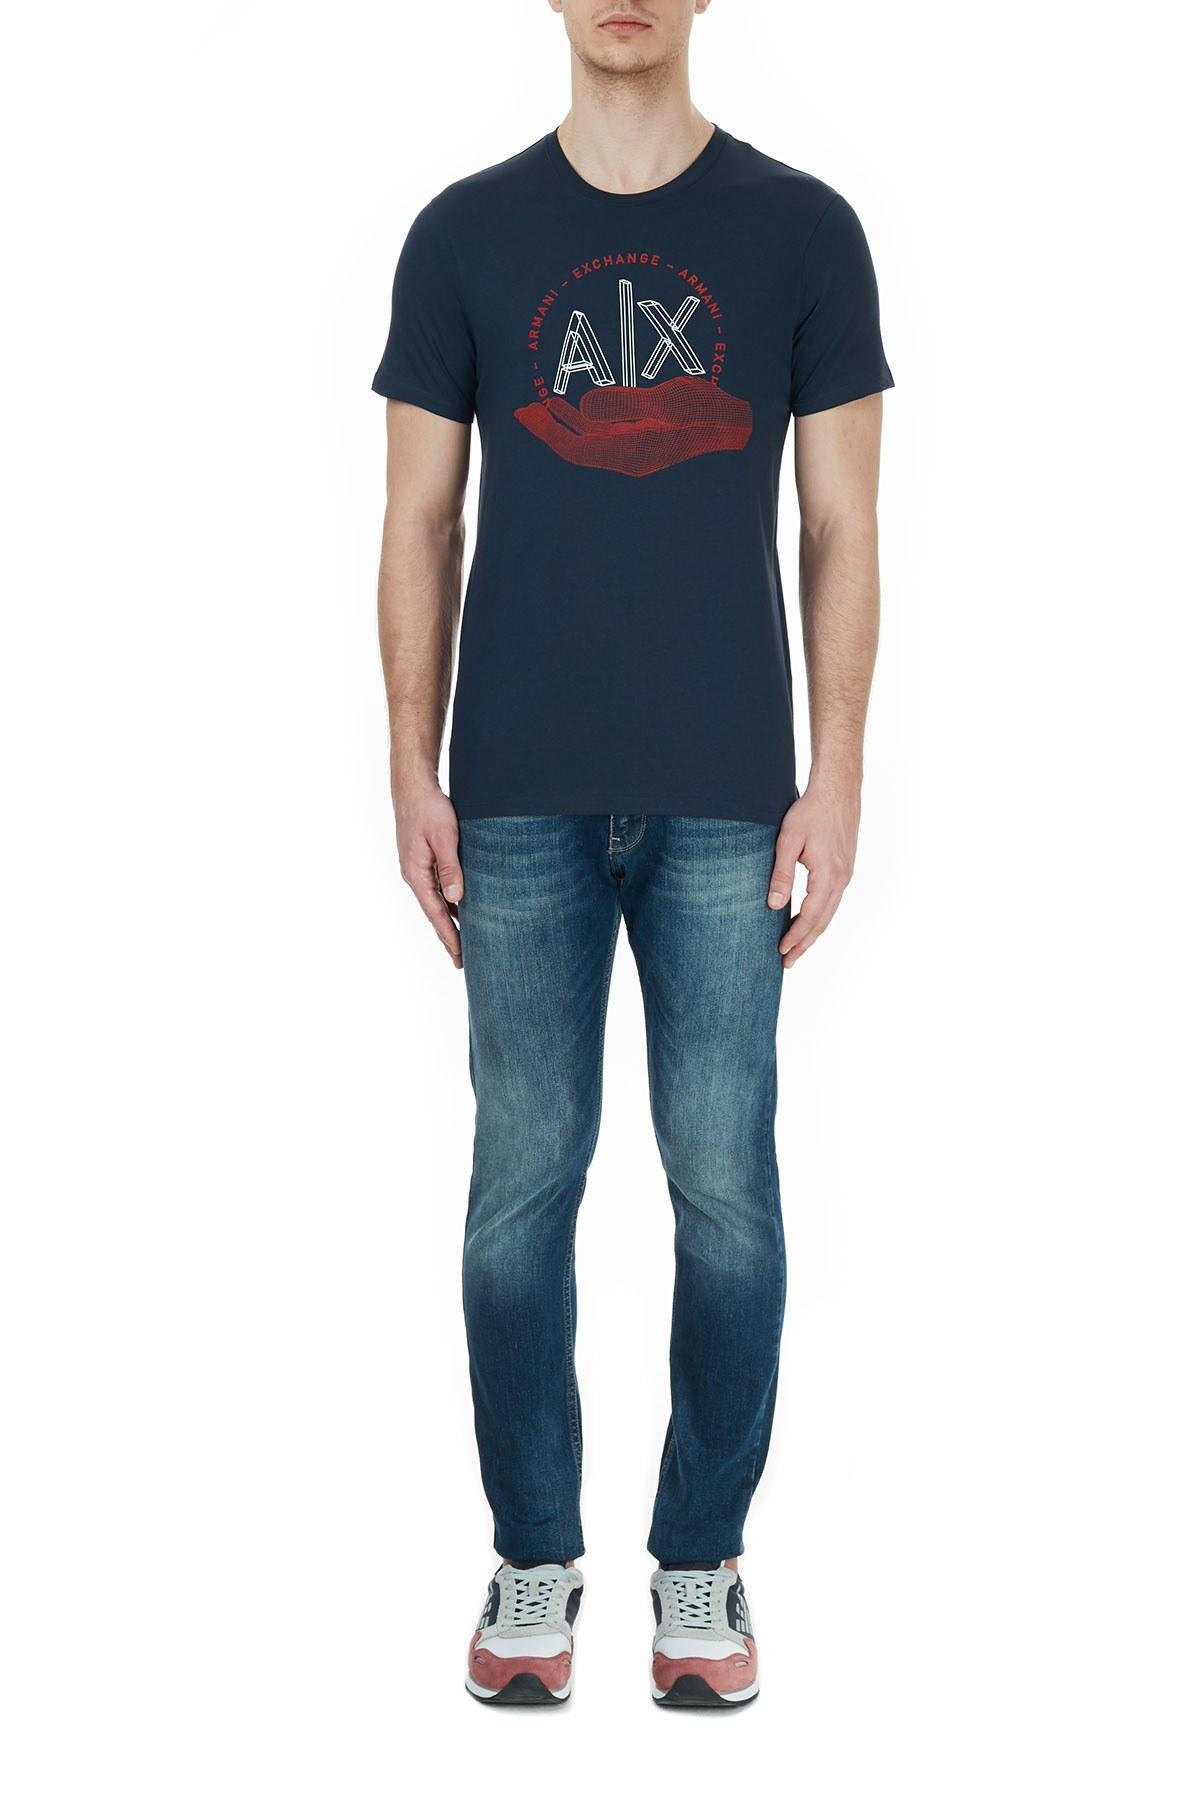 Armani Exchange % 100 Pamuklu Baskılı Bisiklet Yaka Erkek T Shirt 6HZTAN ZJN7Z 1510 LACİVERT